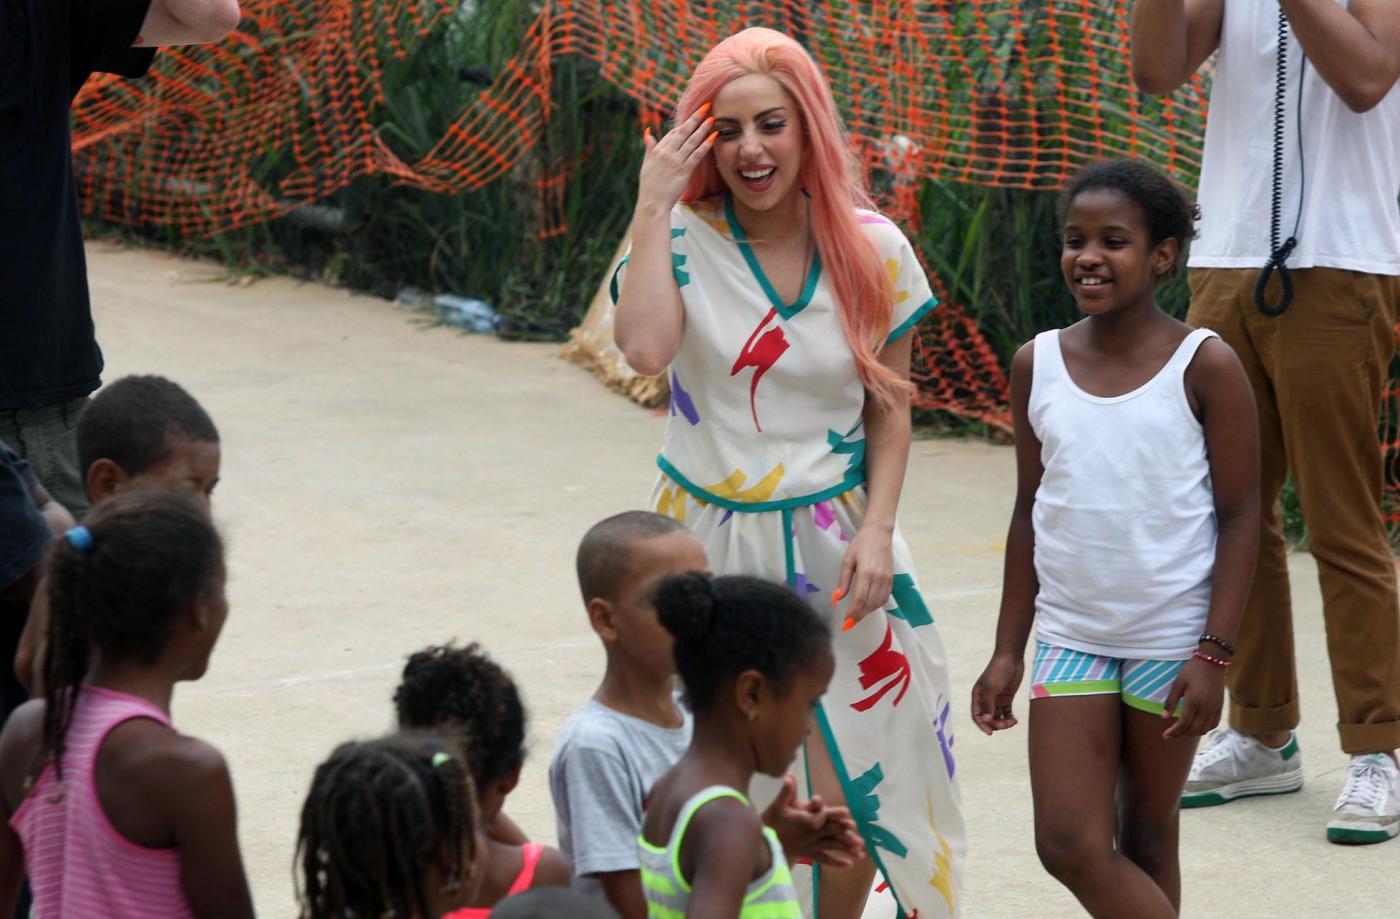 Lady Gaga a piedi nudi a Rio de Janeiro07